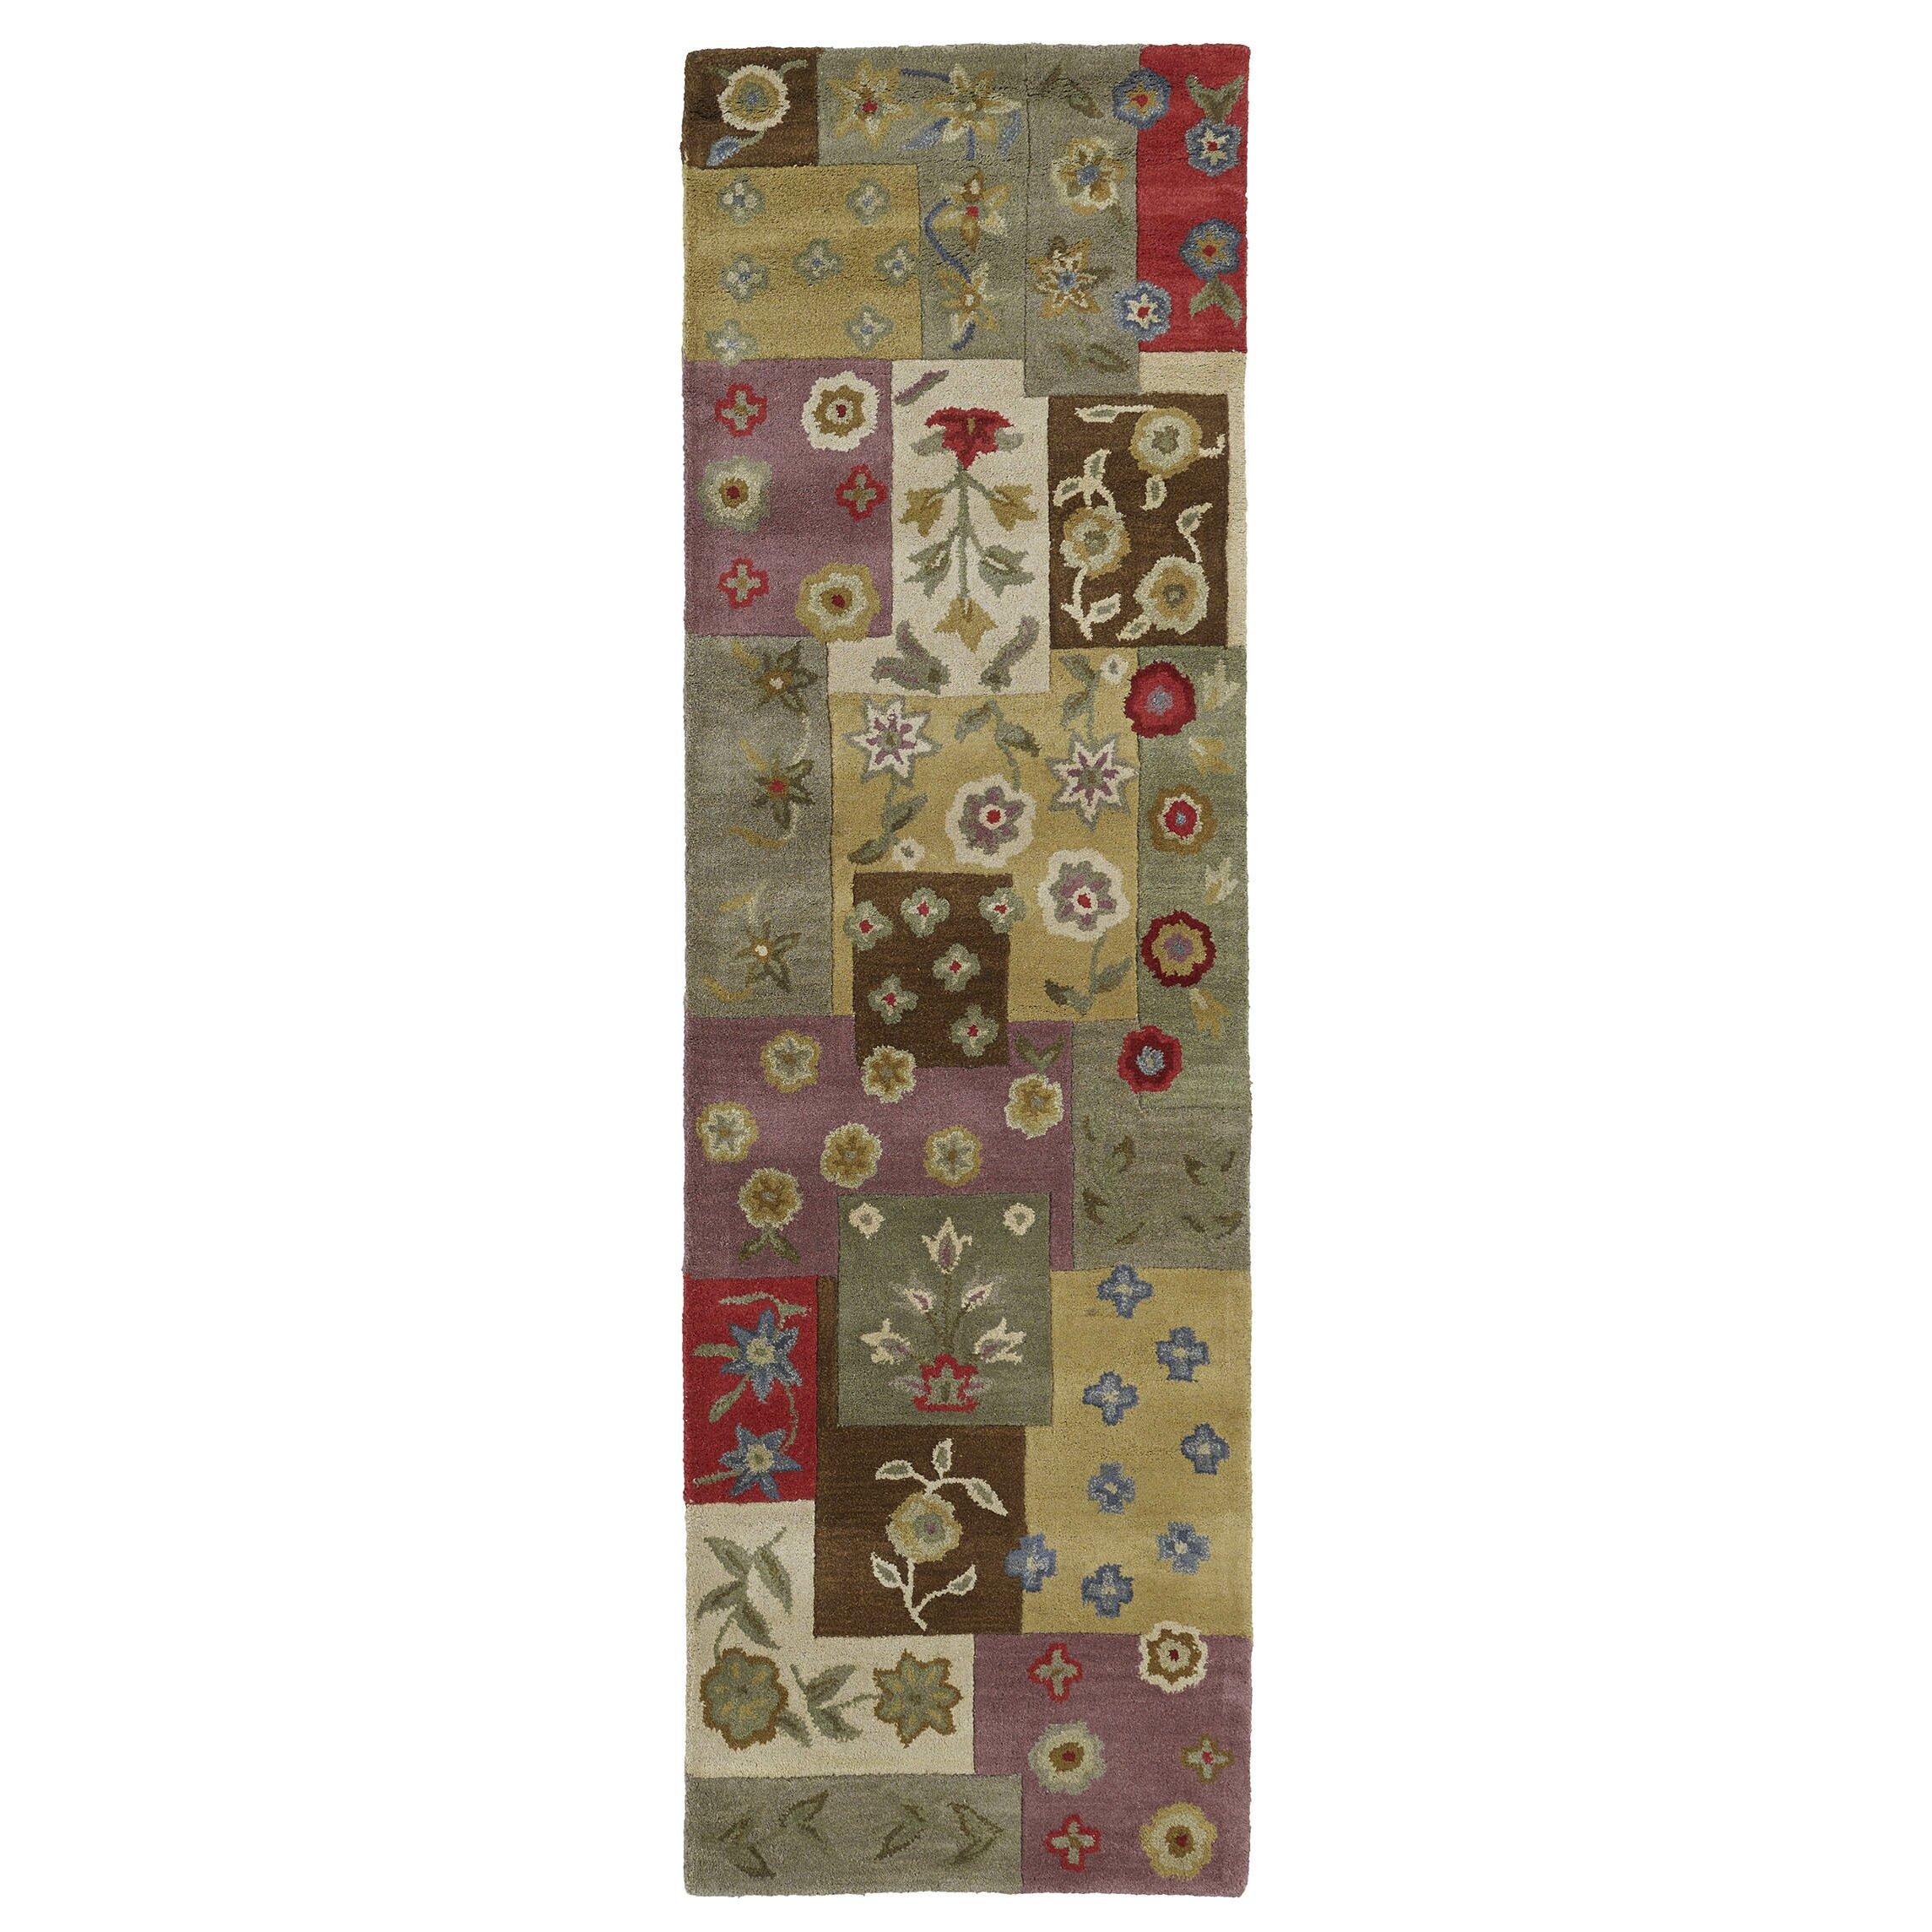 8 Apsley Place Kaleen Kaleen Khazana Patchwork Ivory Quilt Rug